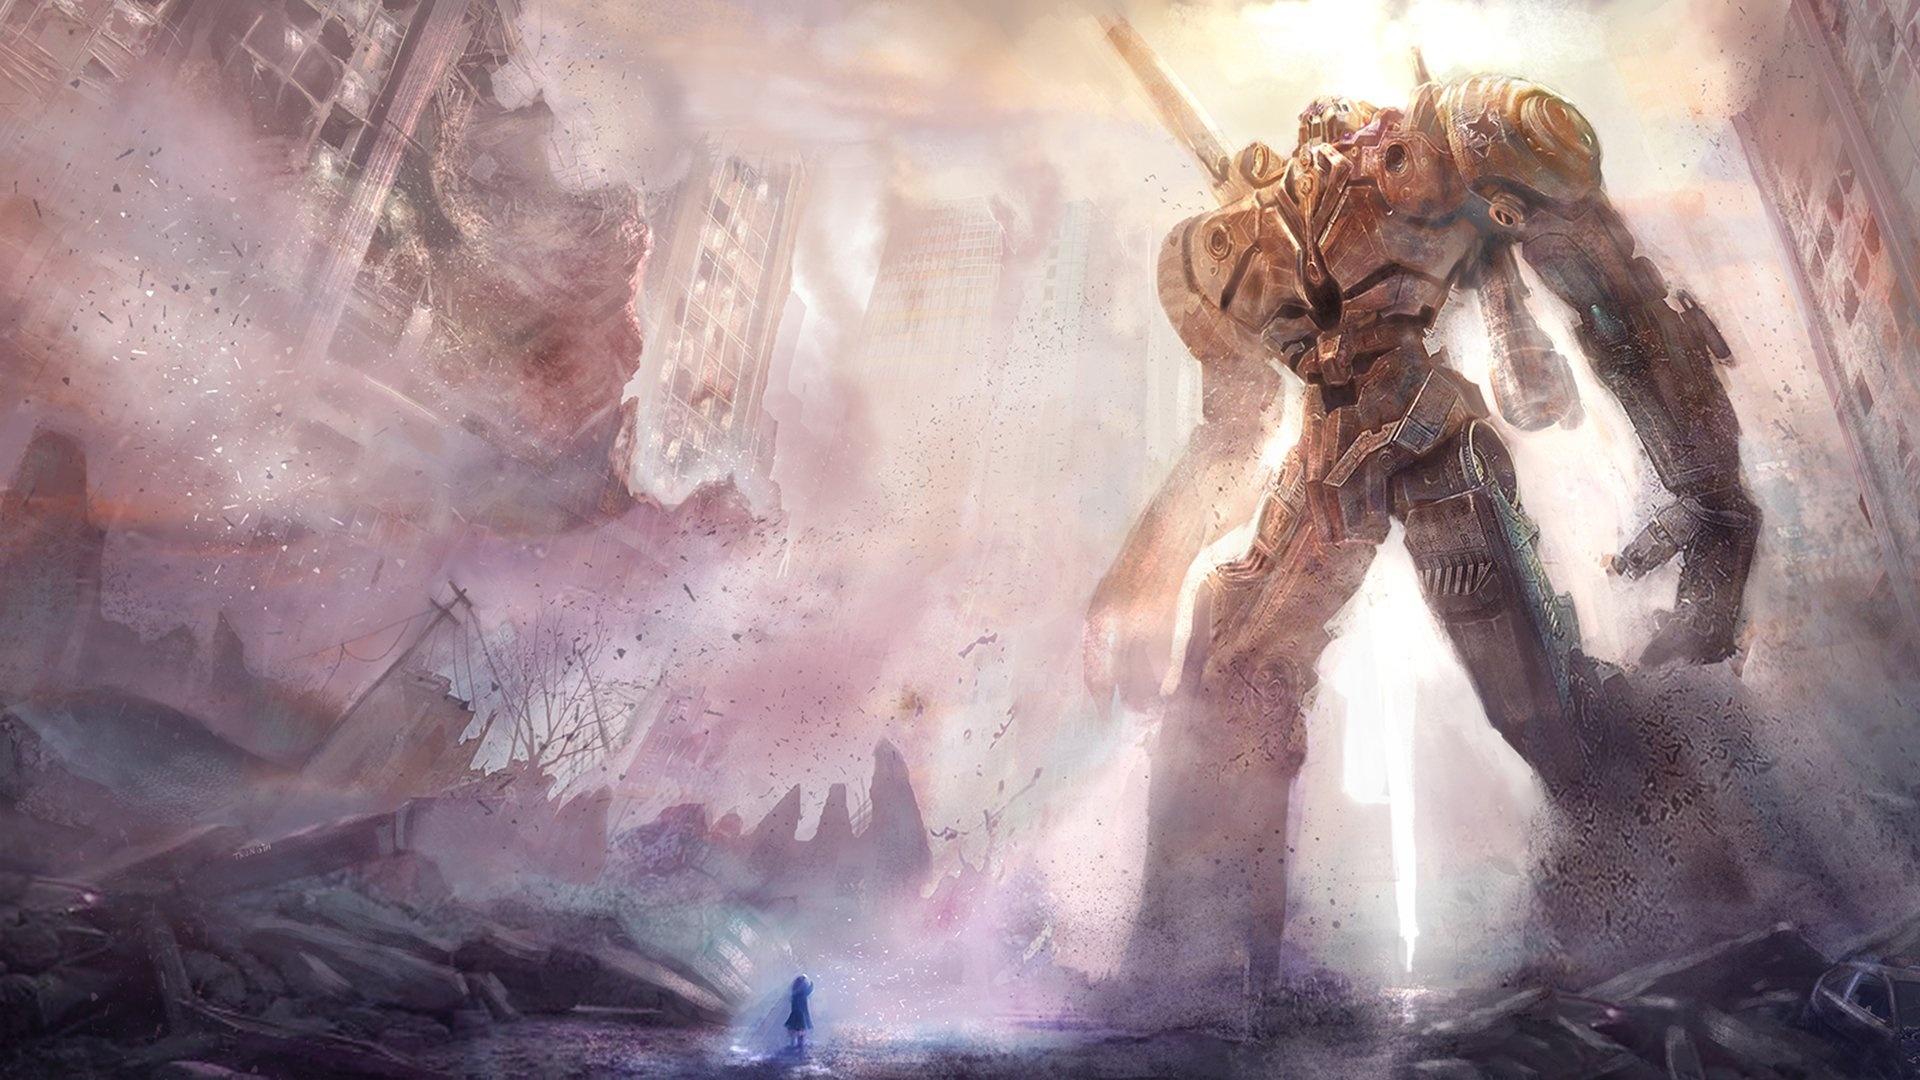 Giant Art free background